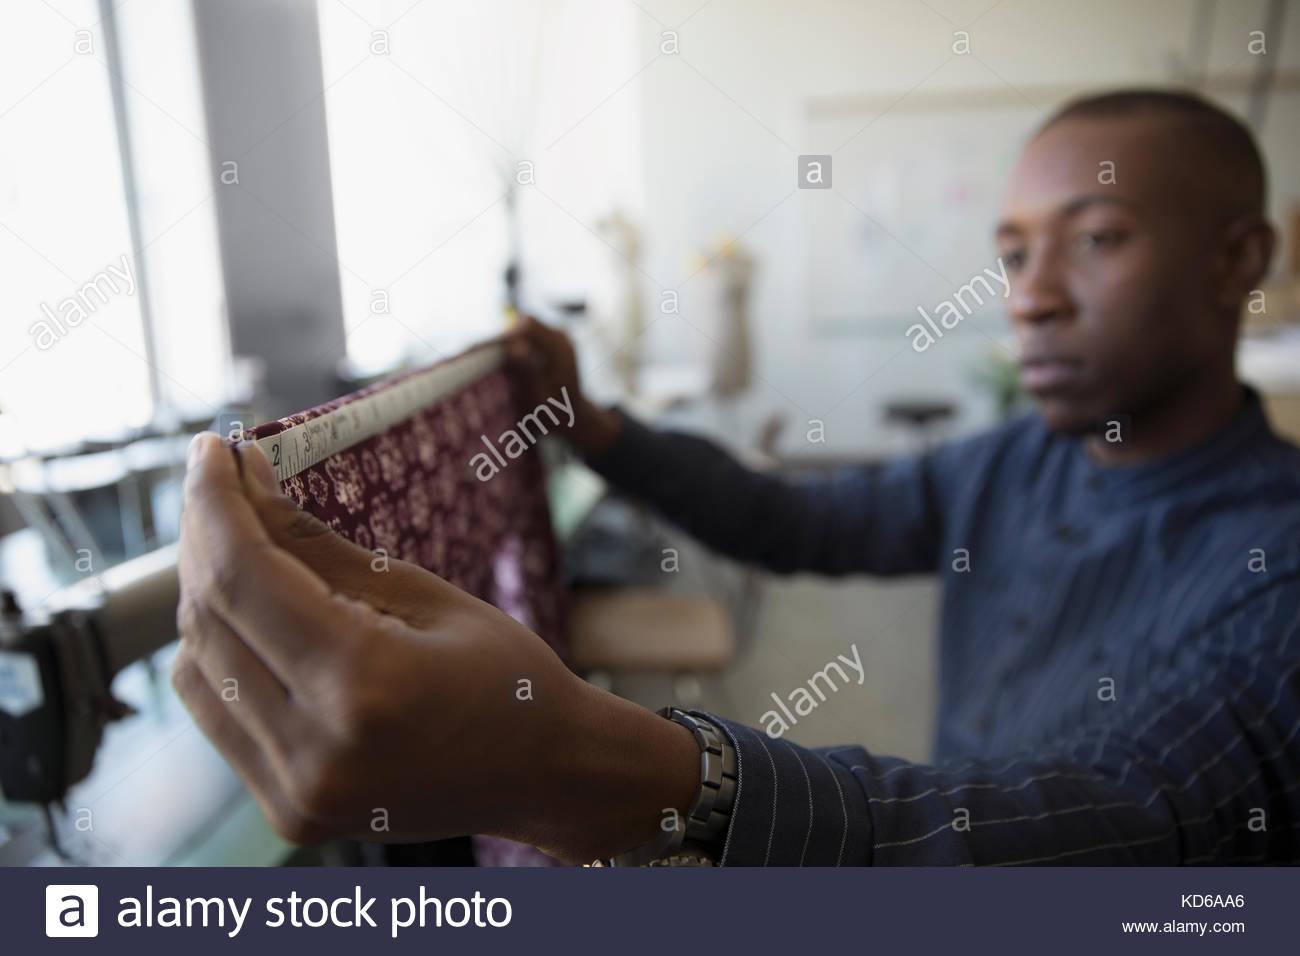 Focused male fashion designer measuring fabric in studio - Stock Image